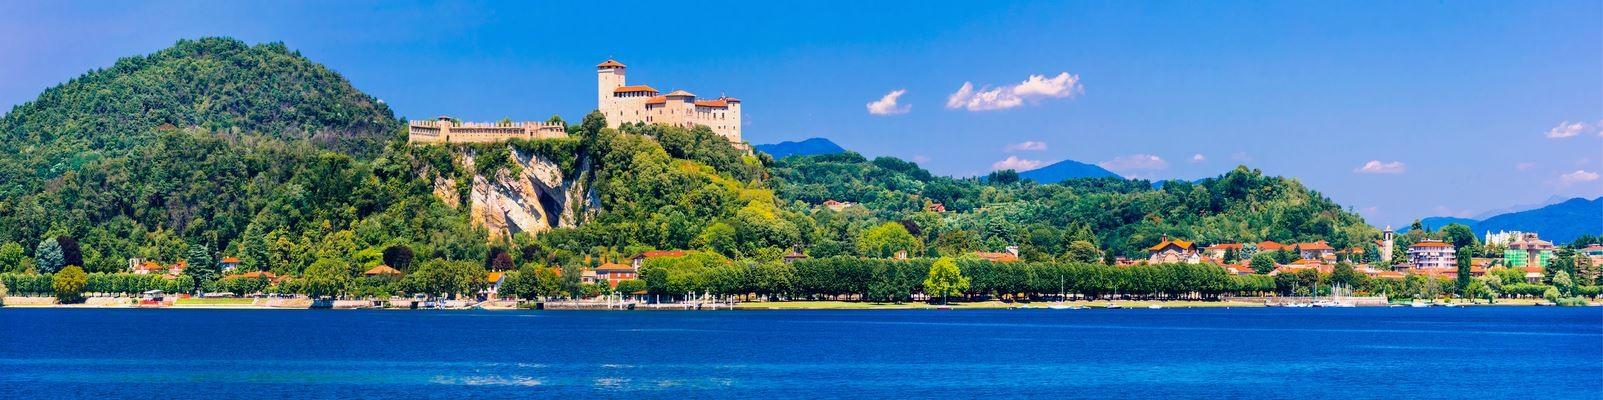 Lago Maggiore - hrad v městečku Angera